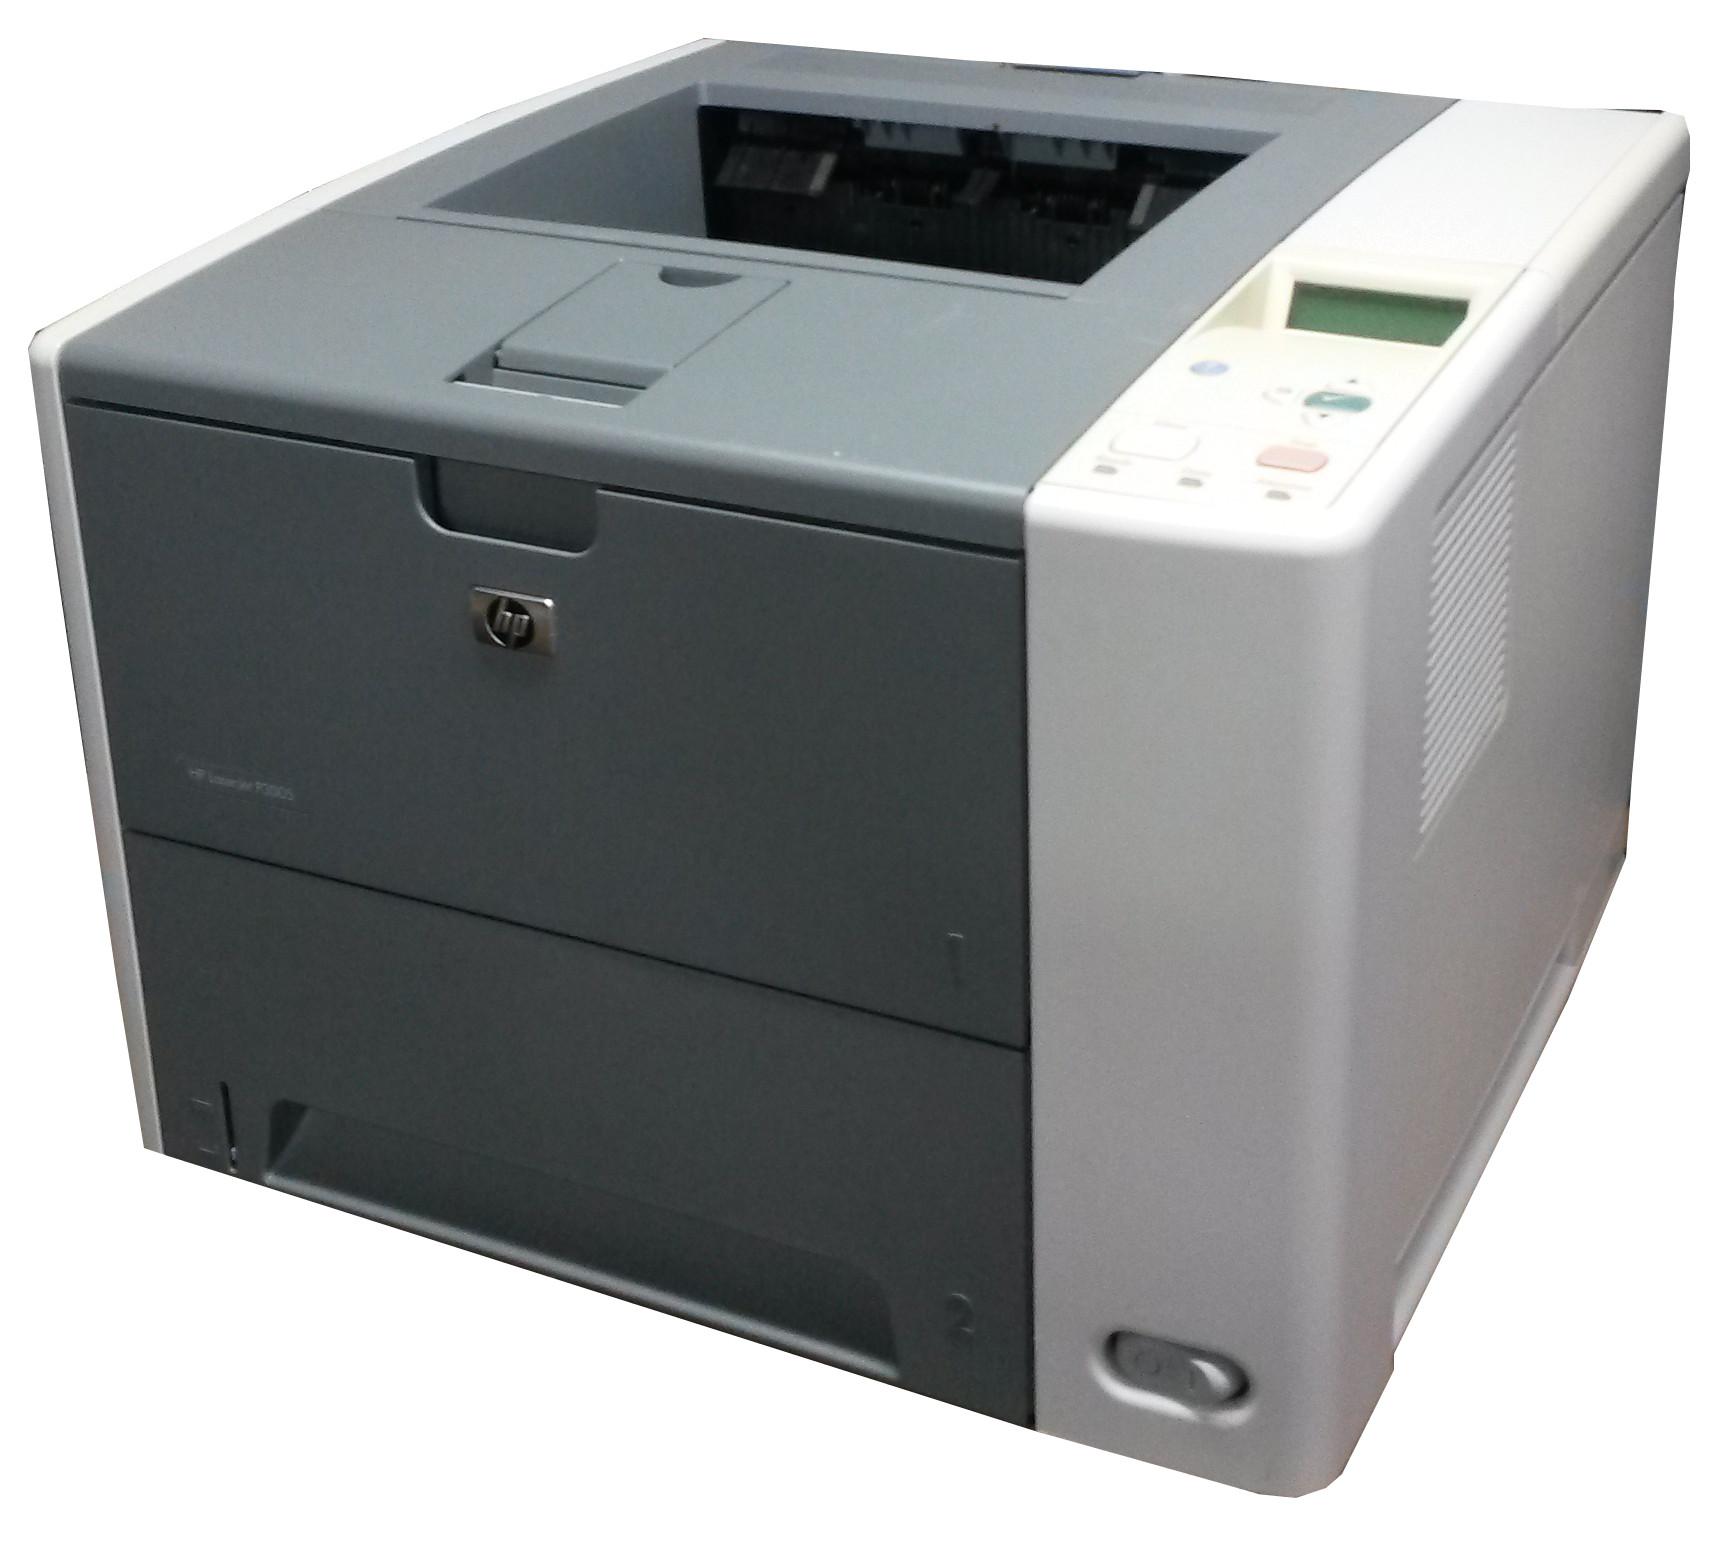 Hp Laserjet P3005 Laser Printer Reconditioned